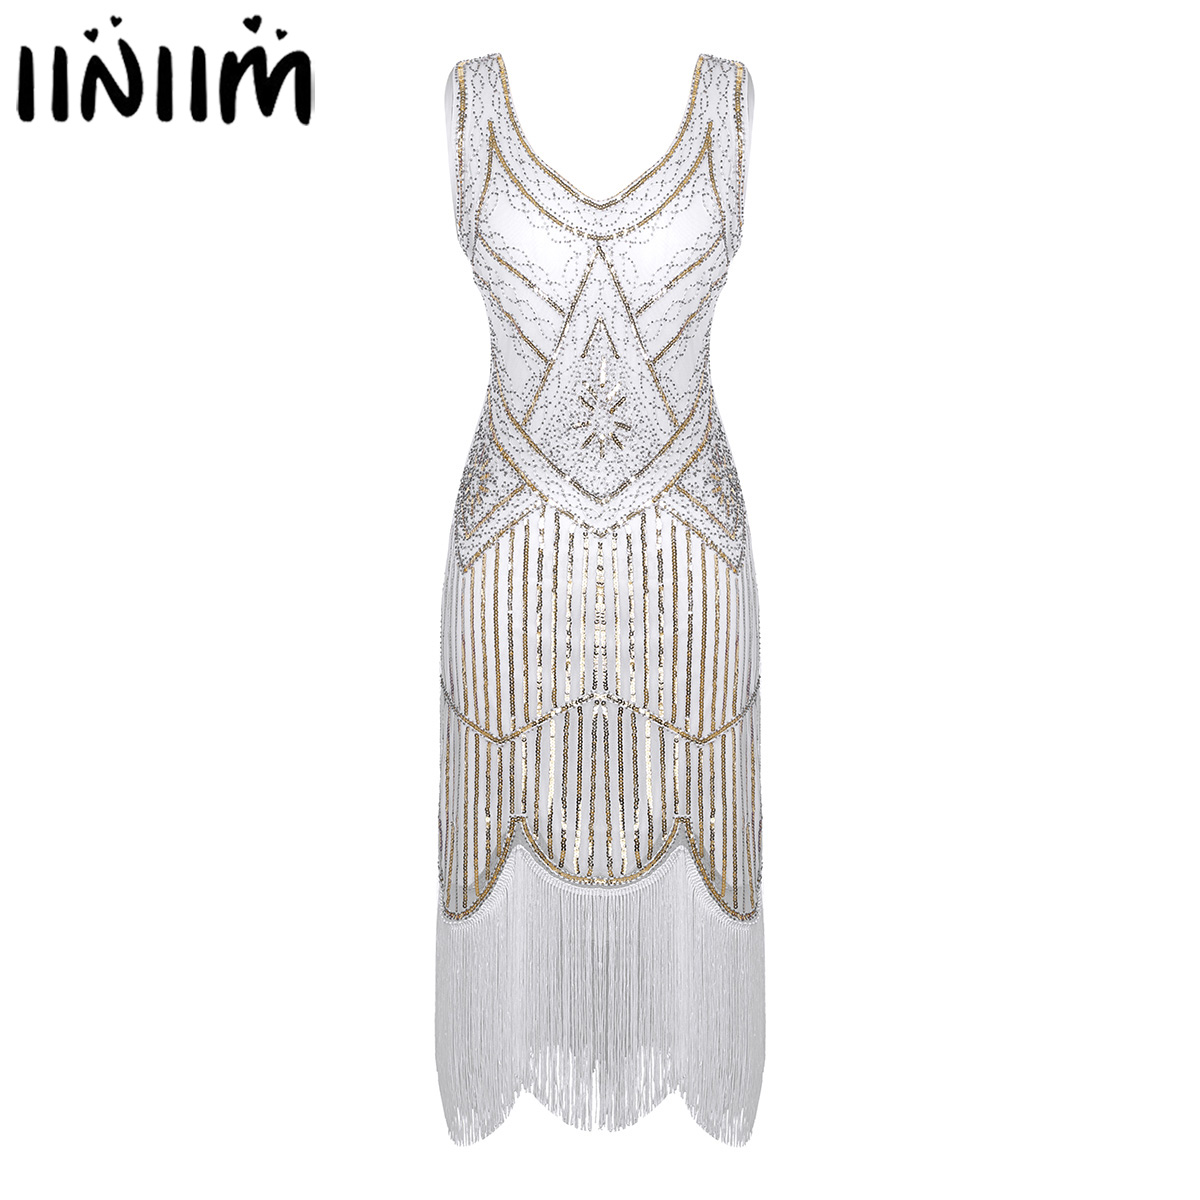 Womens Glitter Reflective Beaded Summer Dress For Jazz Dance Wear Fringed Tassels Hem Flapper Dress Cocktail Leotard Dress